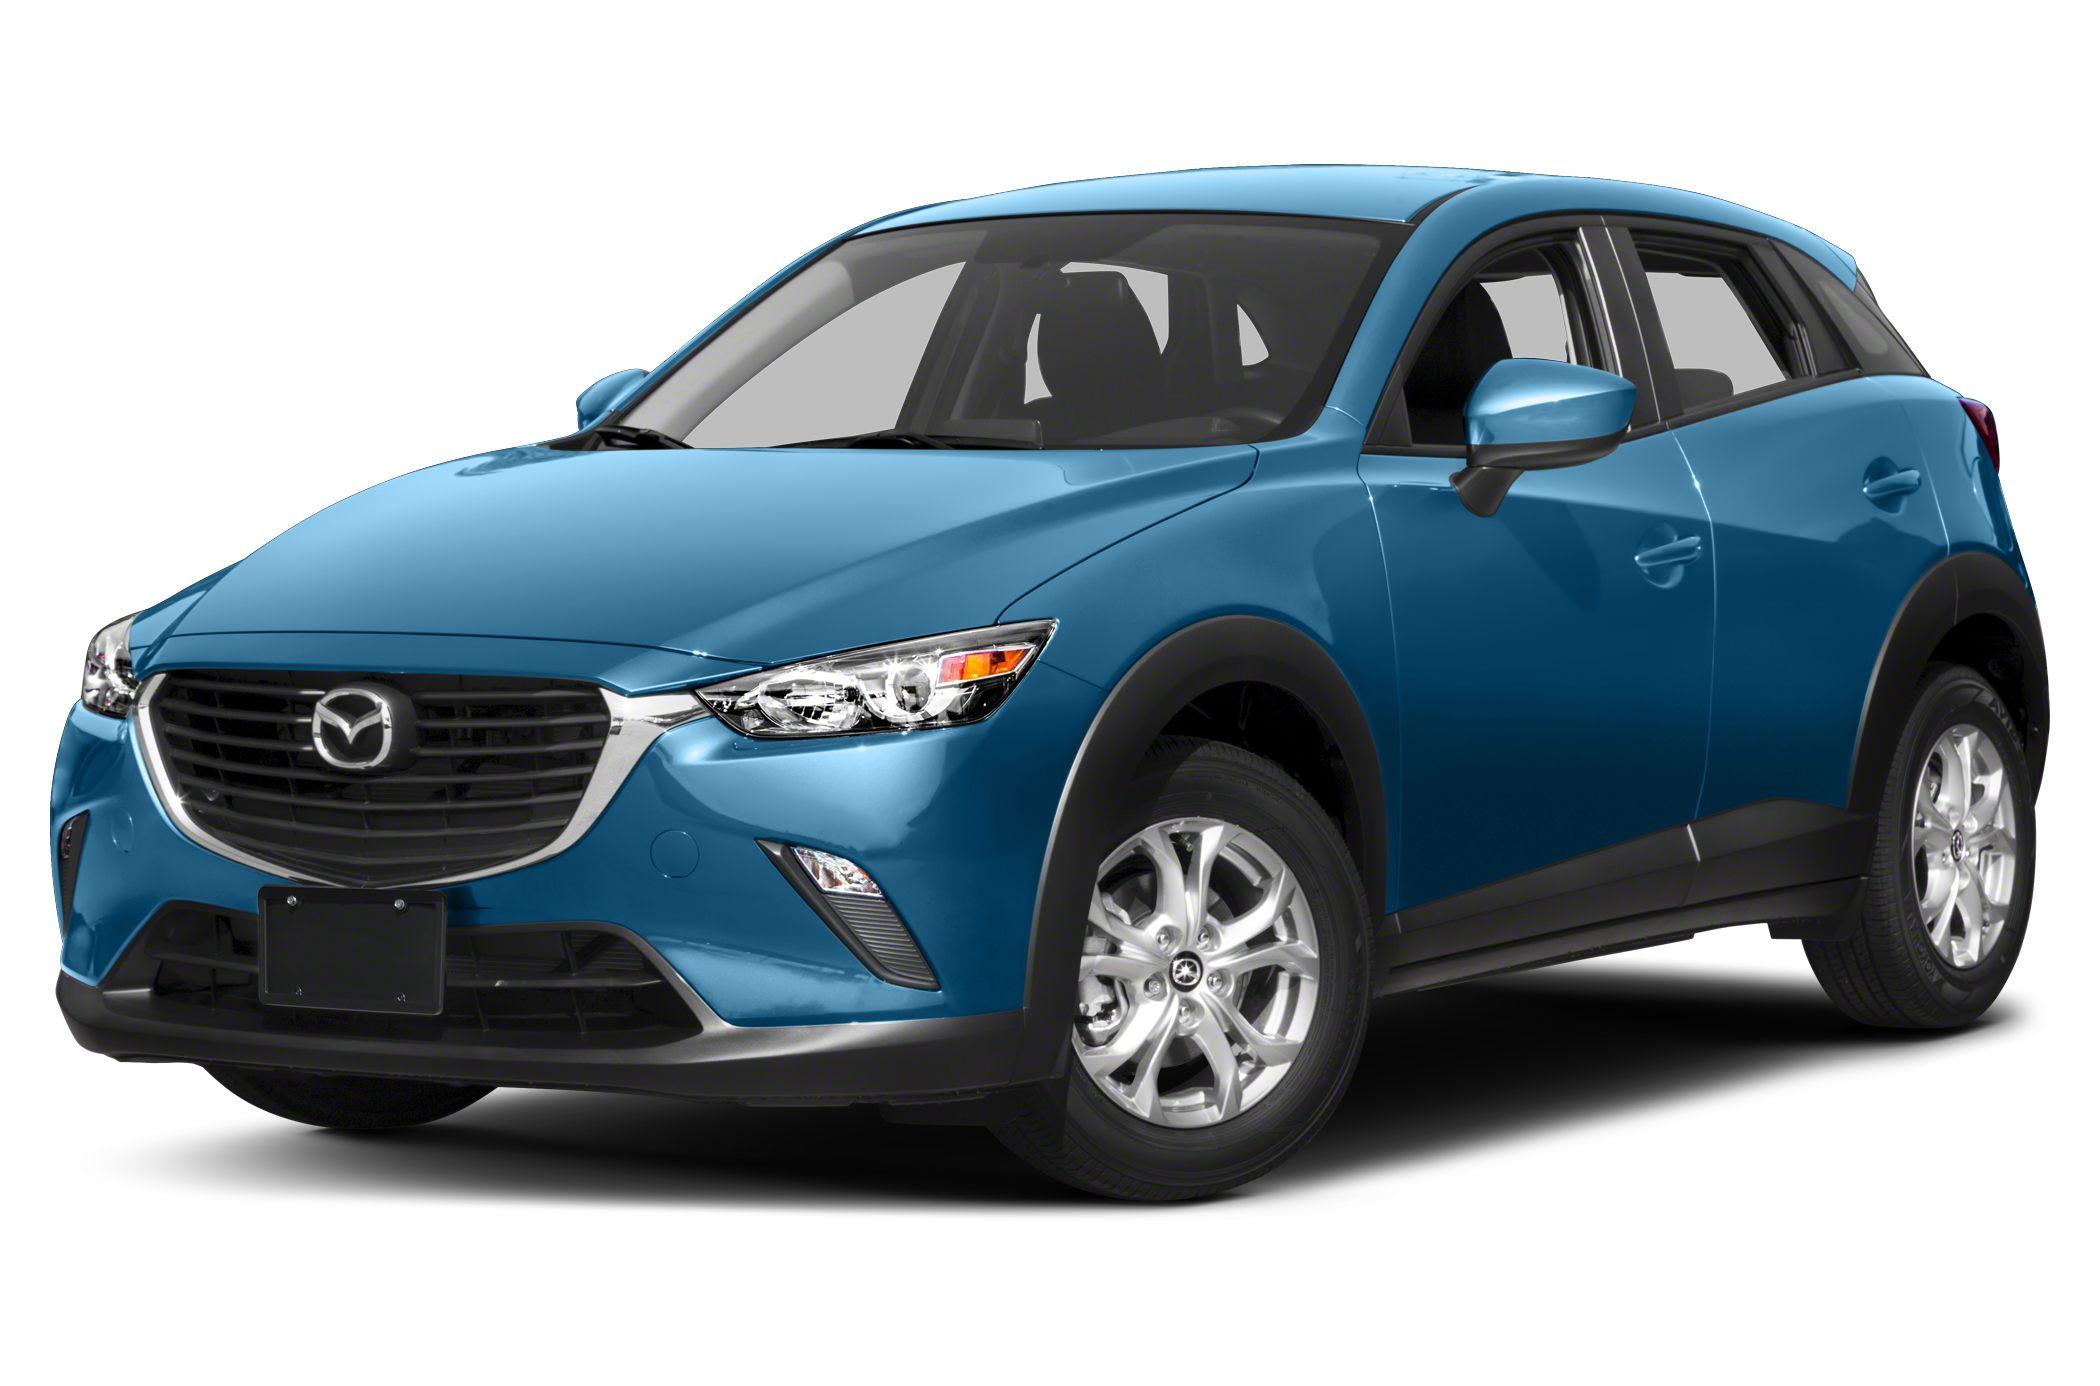 2017 Mazda CX 3 Information